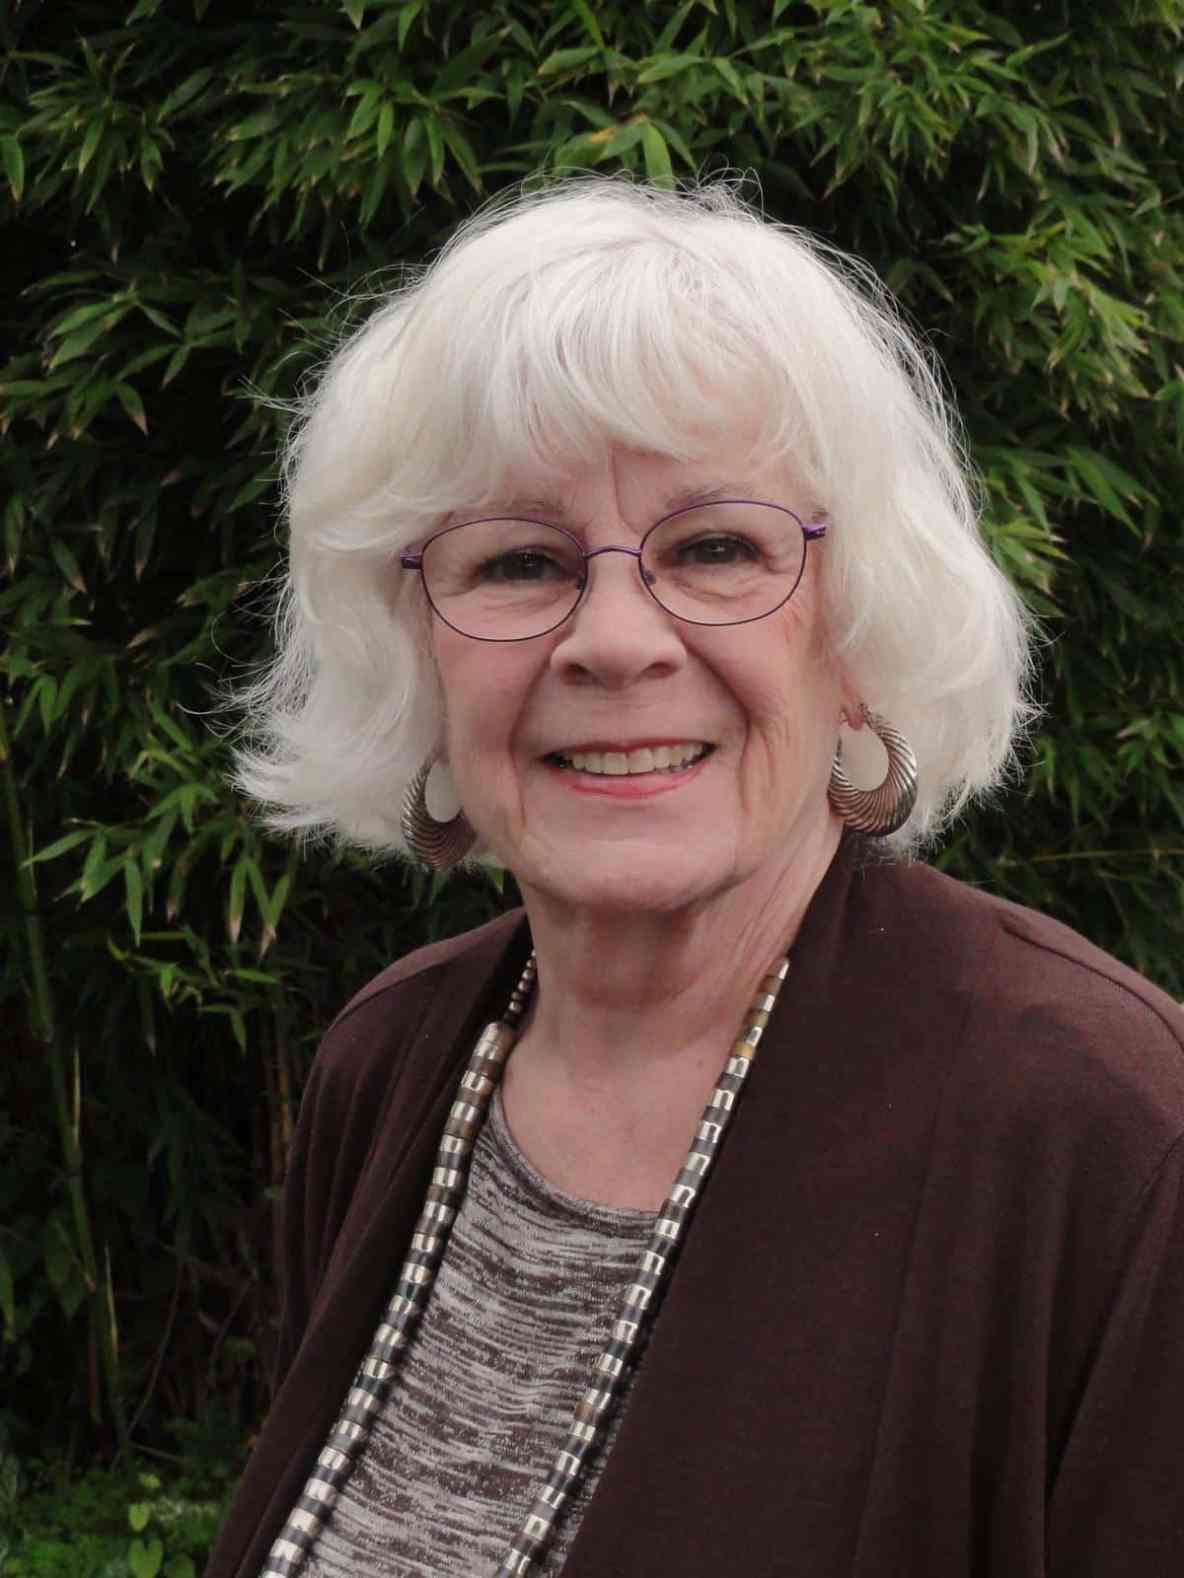 Jane Hill, artSMART